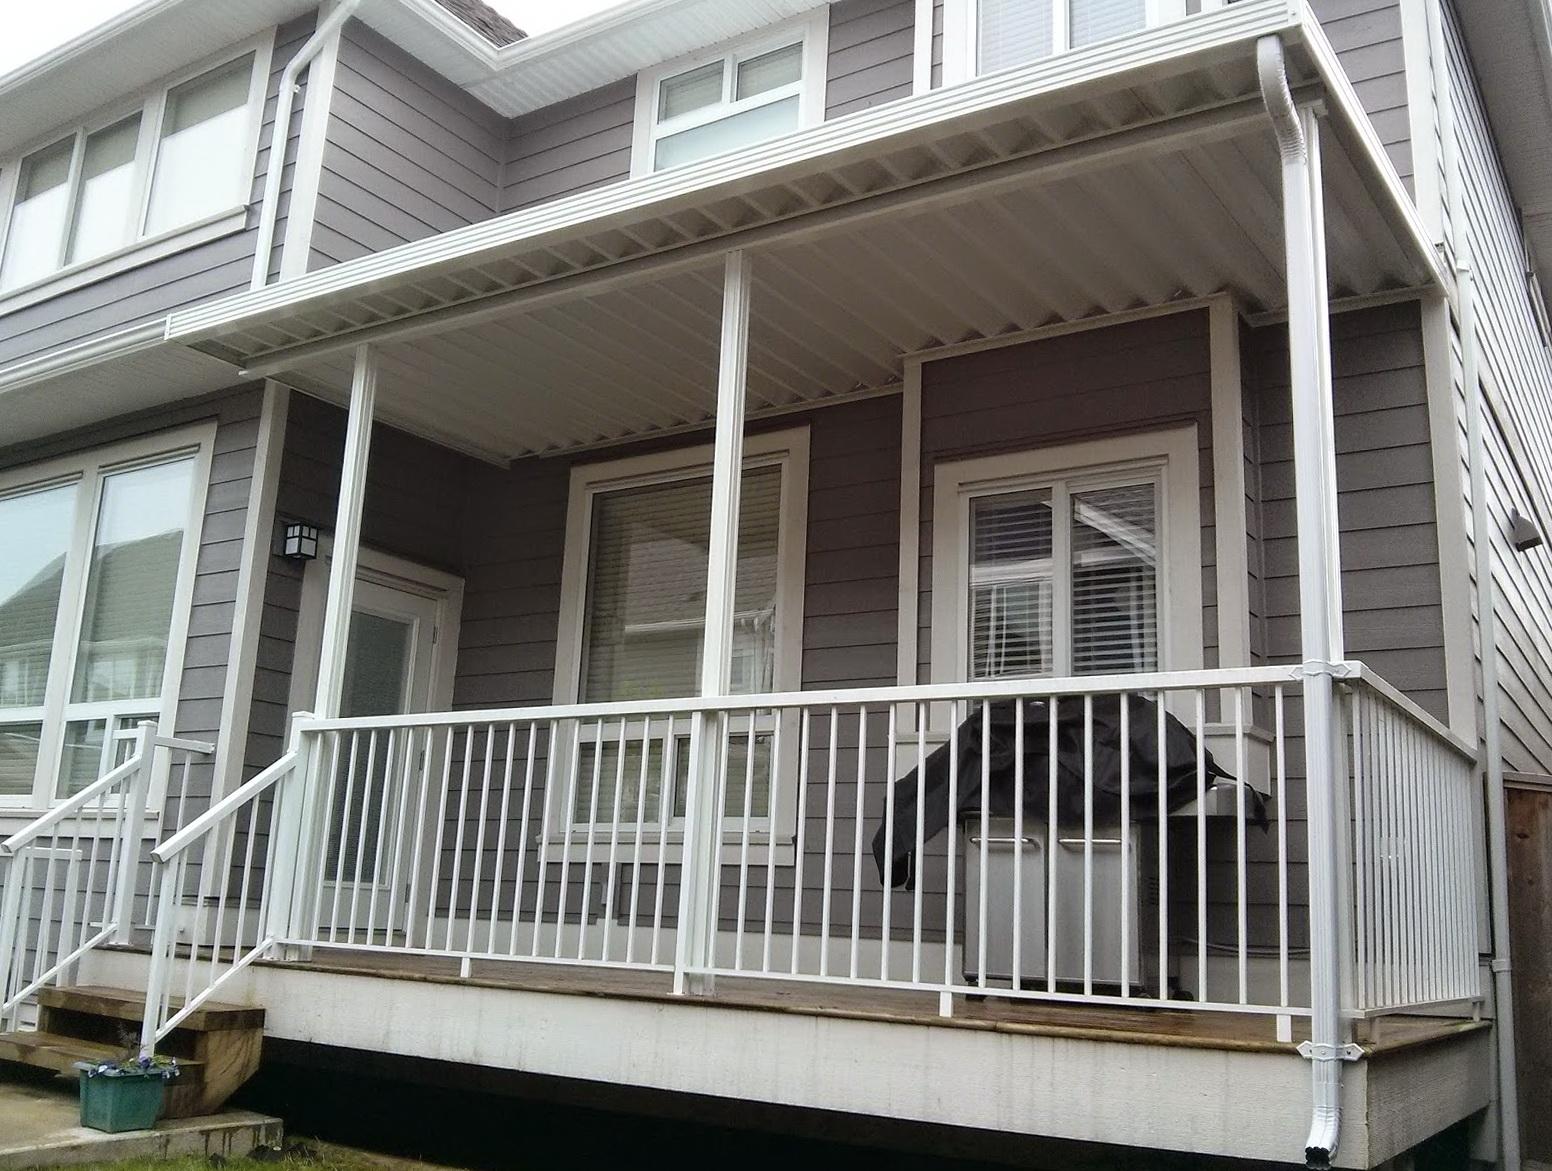 Aluminum Awnings For Decks Home Design Ideas